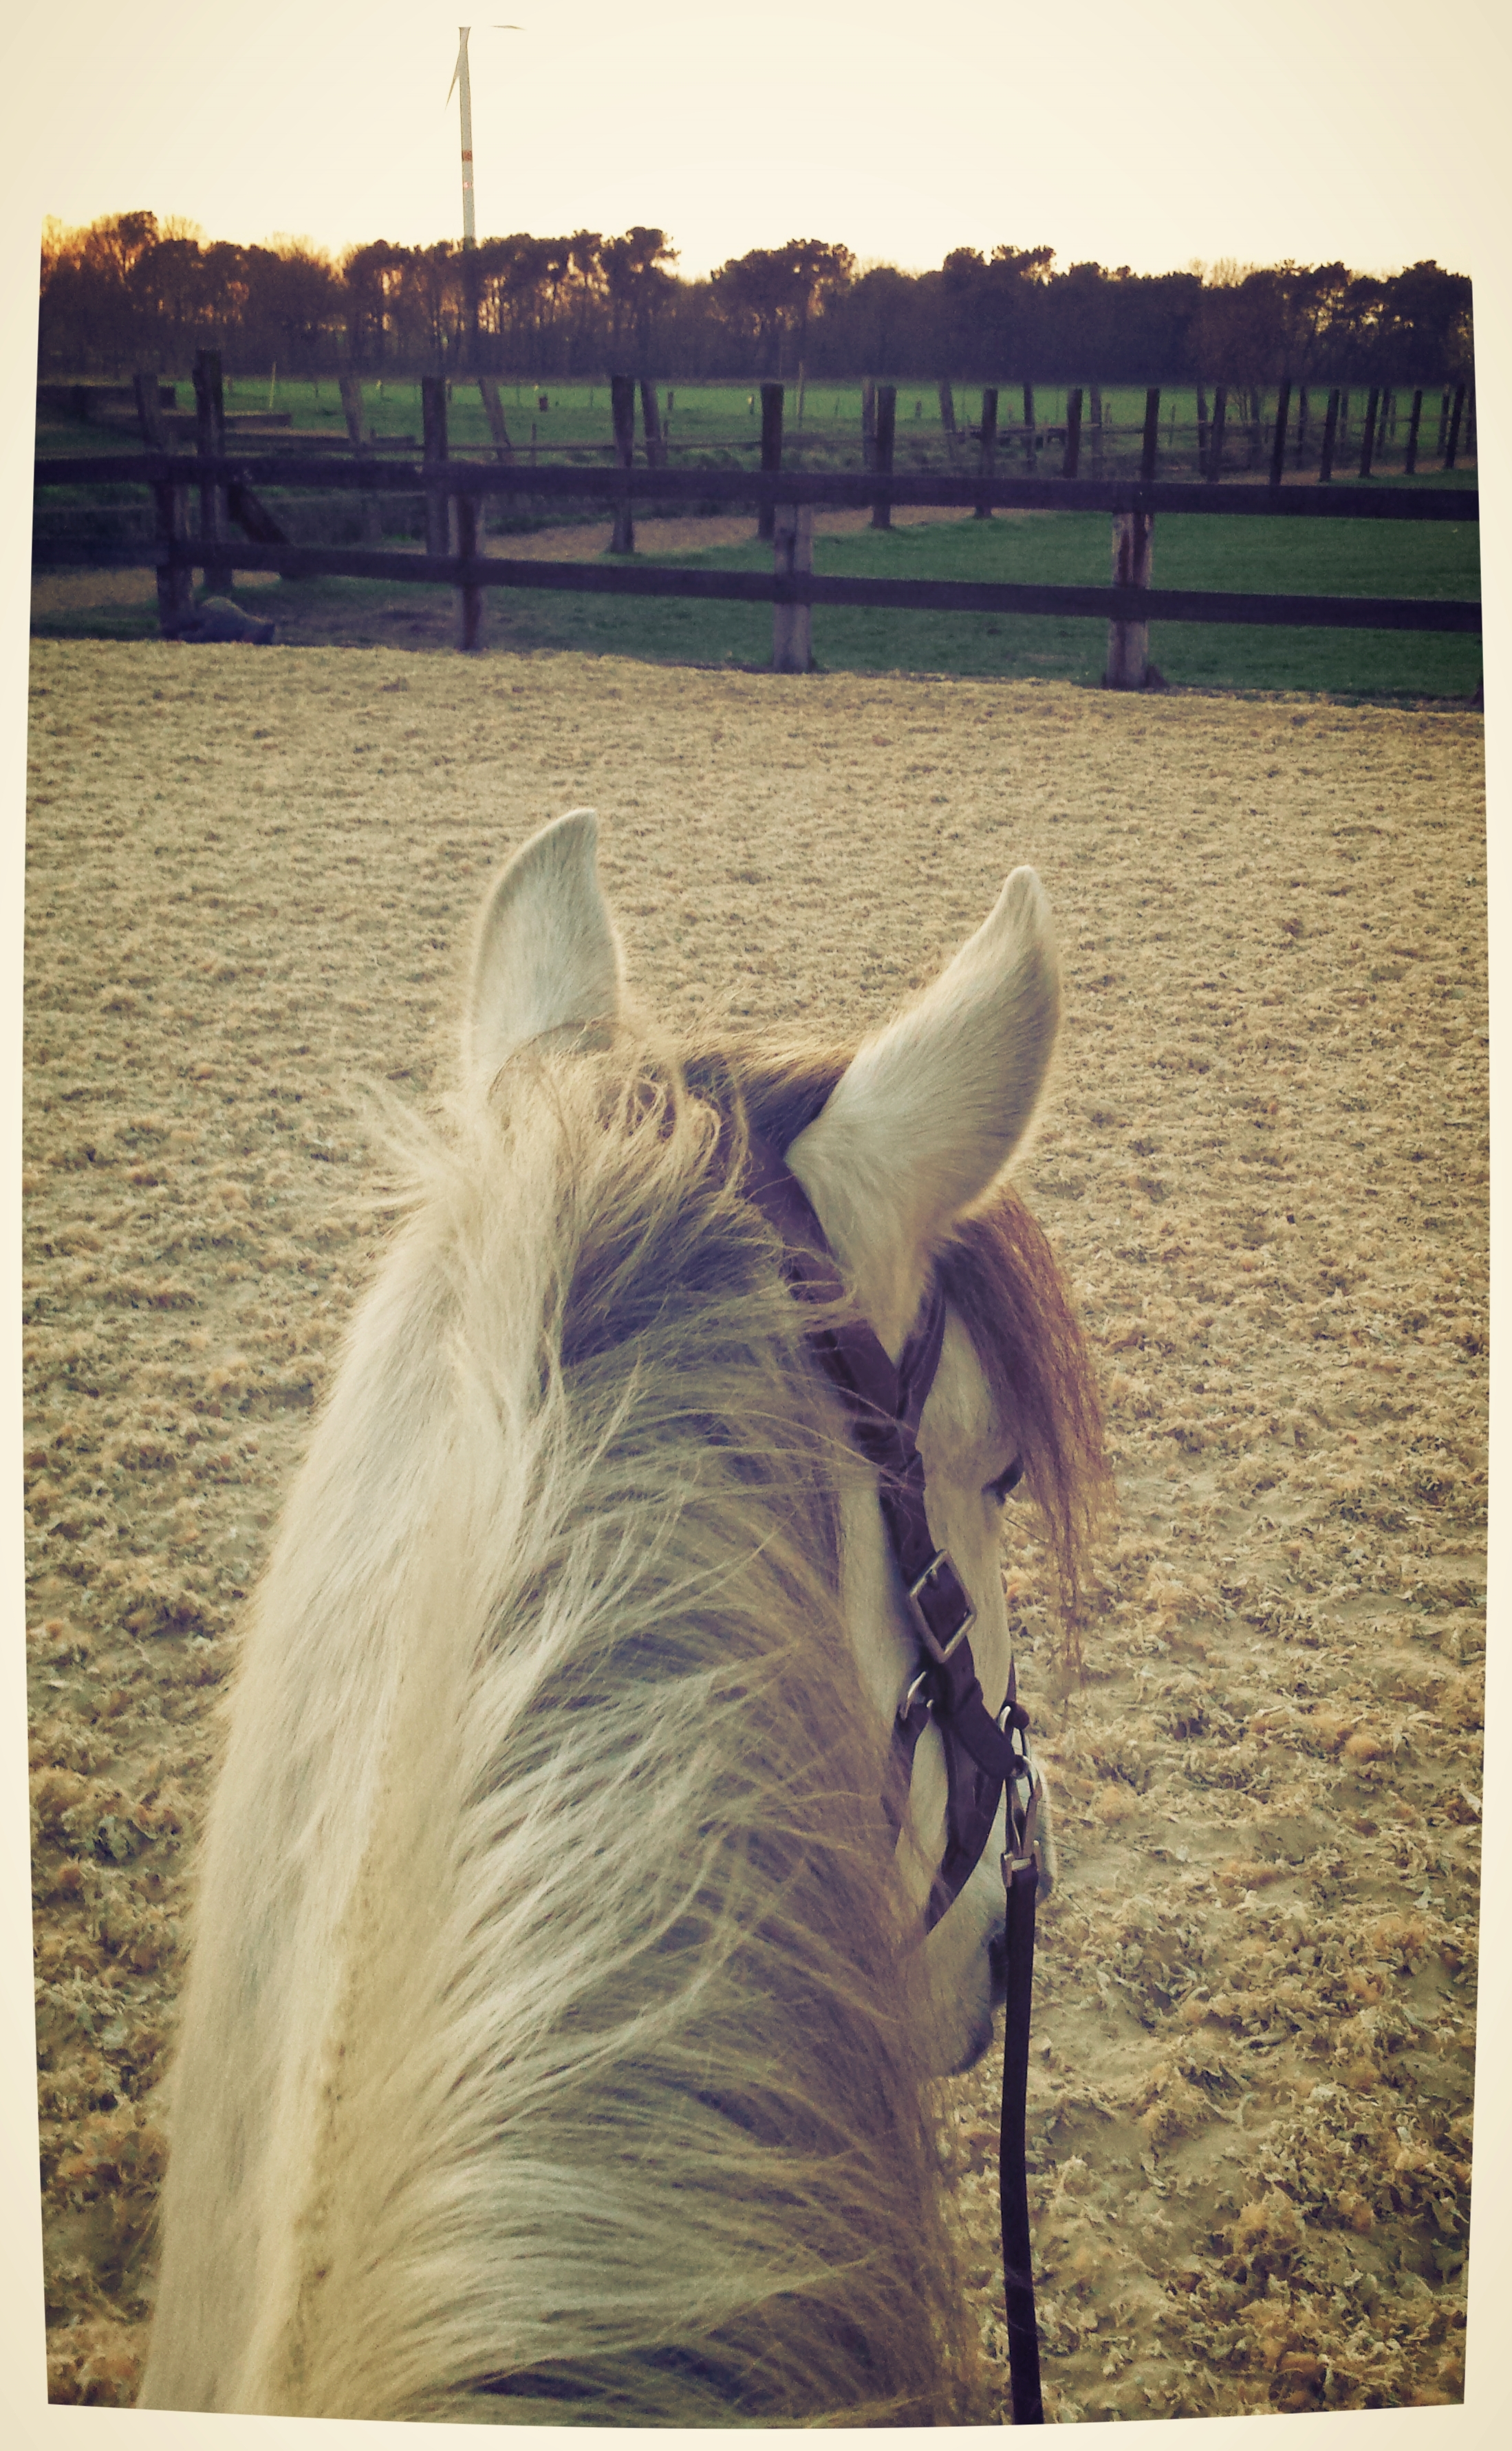 PRE bitloos rijden barbara hoekstra natural horsemanship